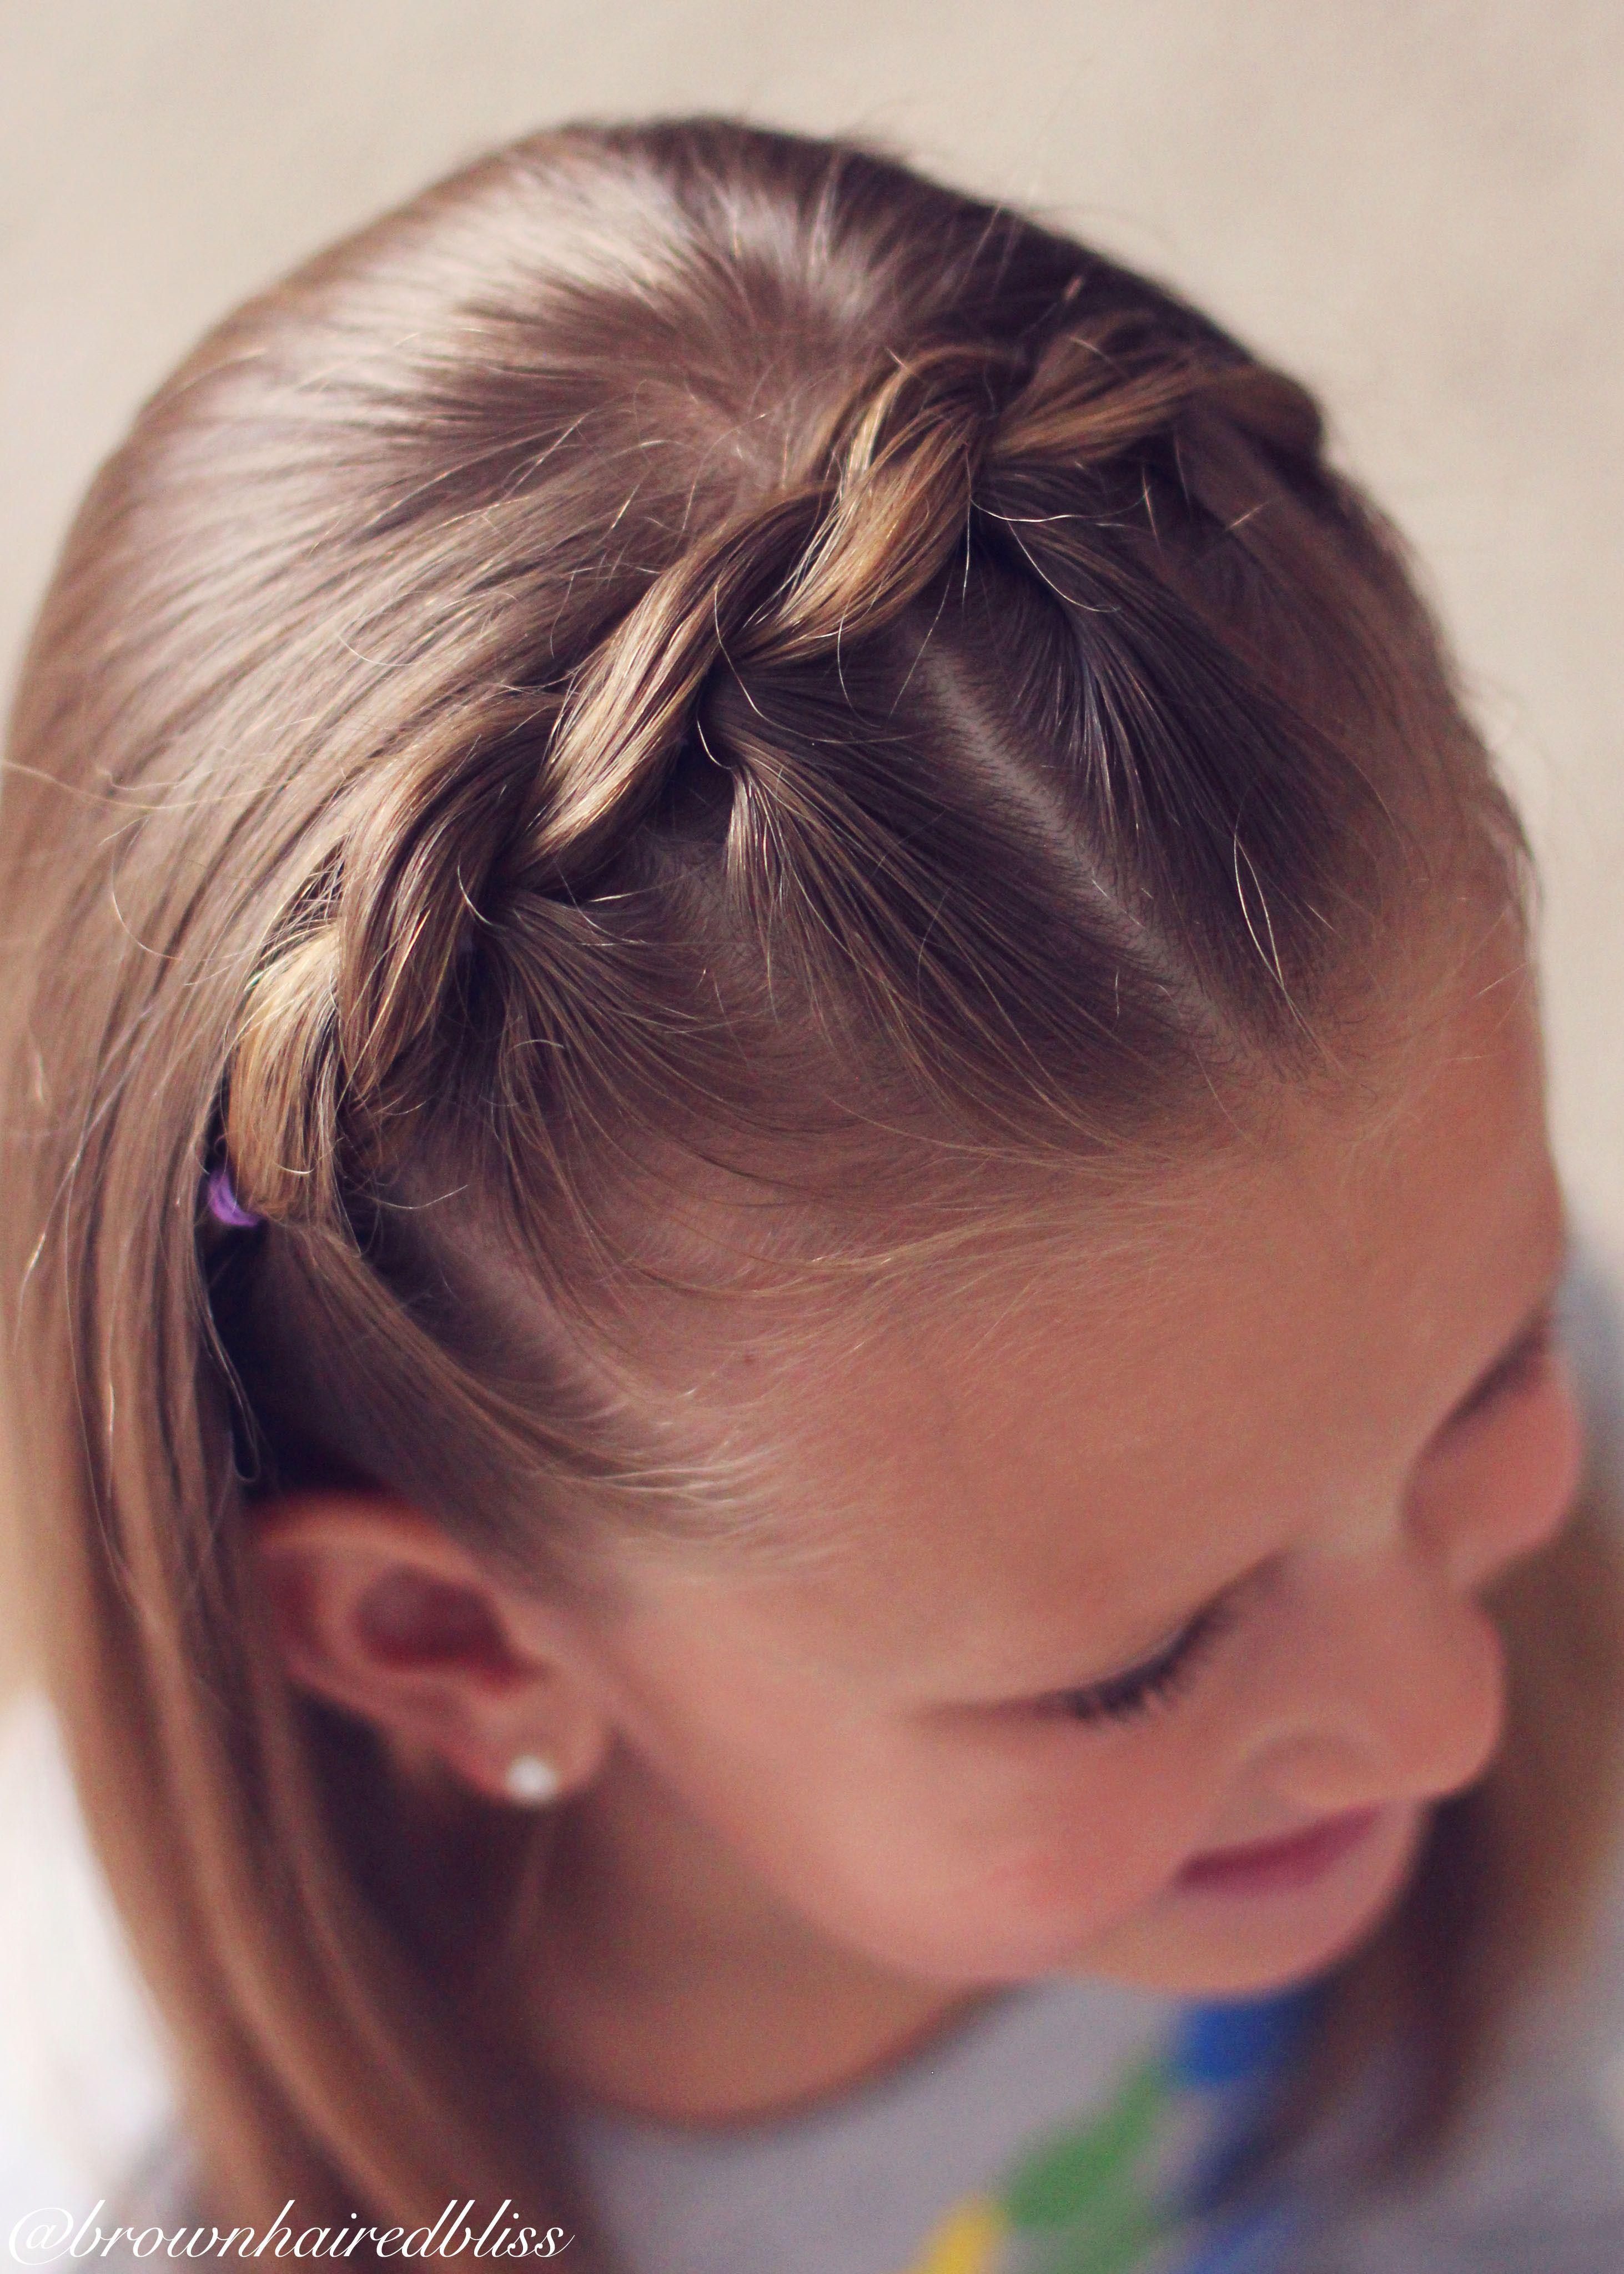 040815   Kid stuff   Pinterest   Hair style, Girl hair and Girl ...